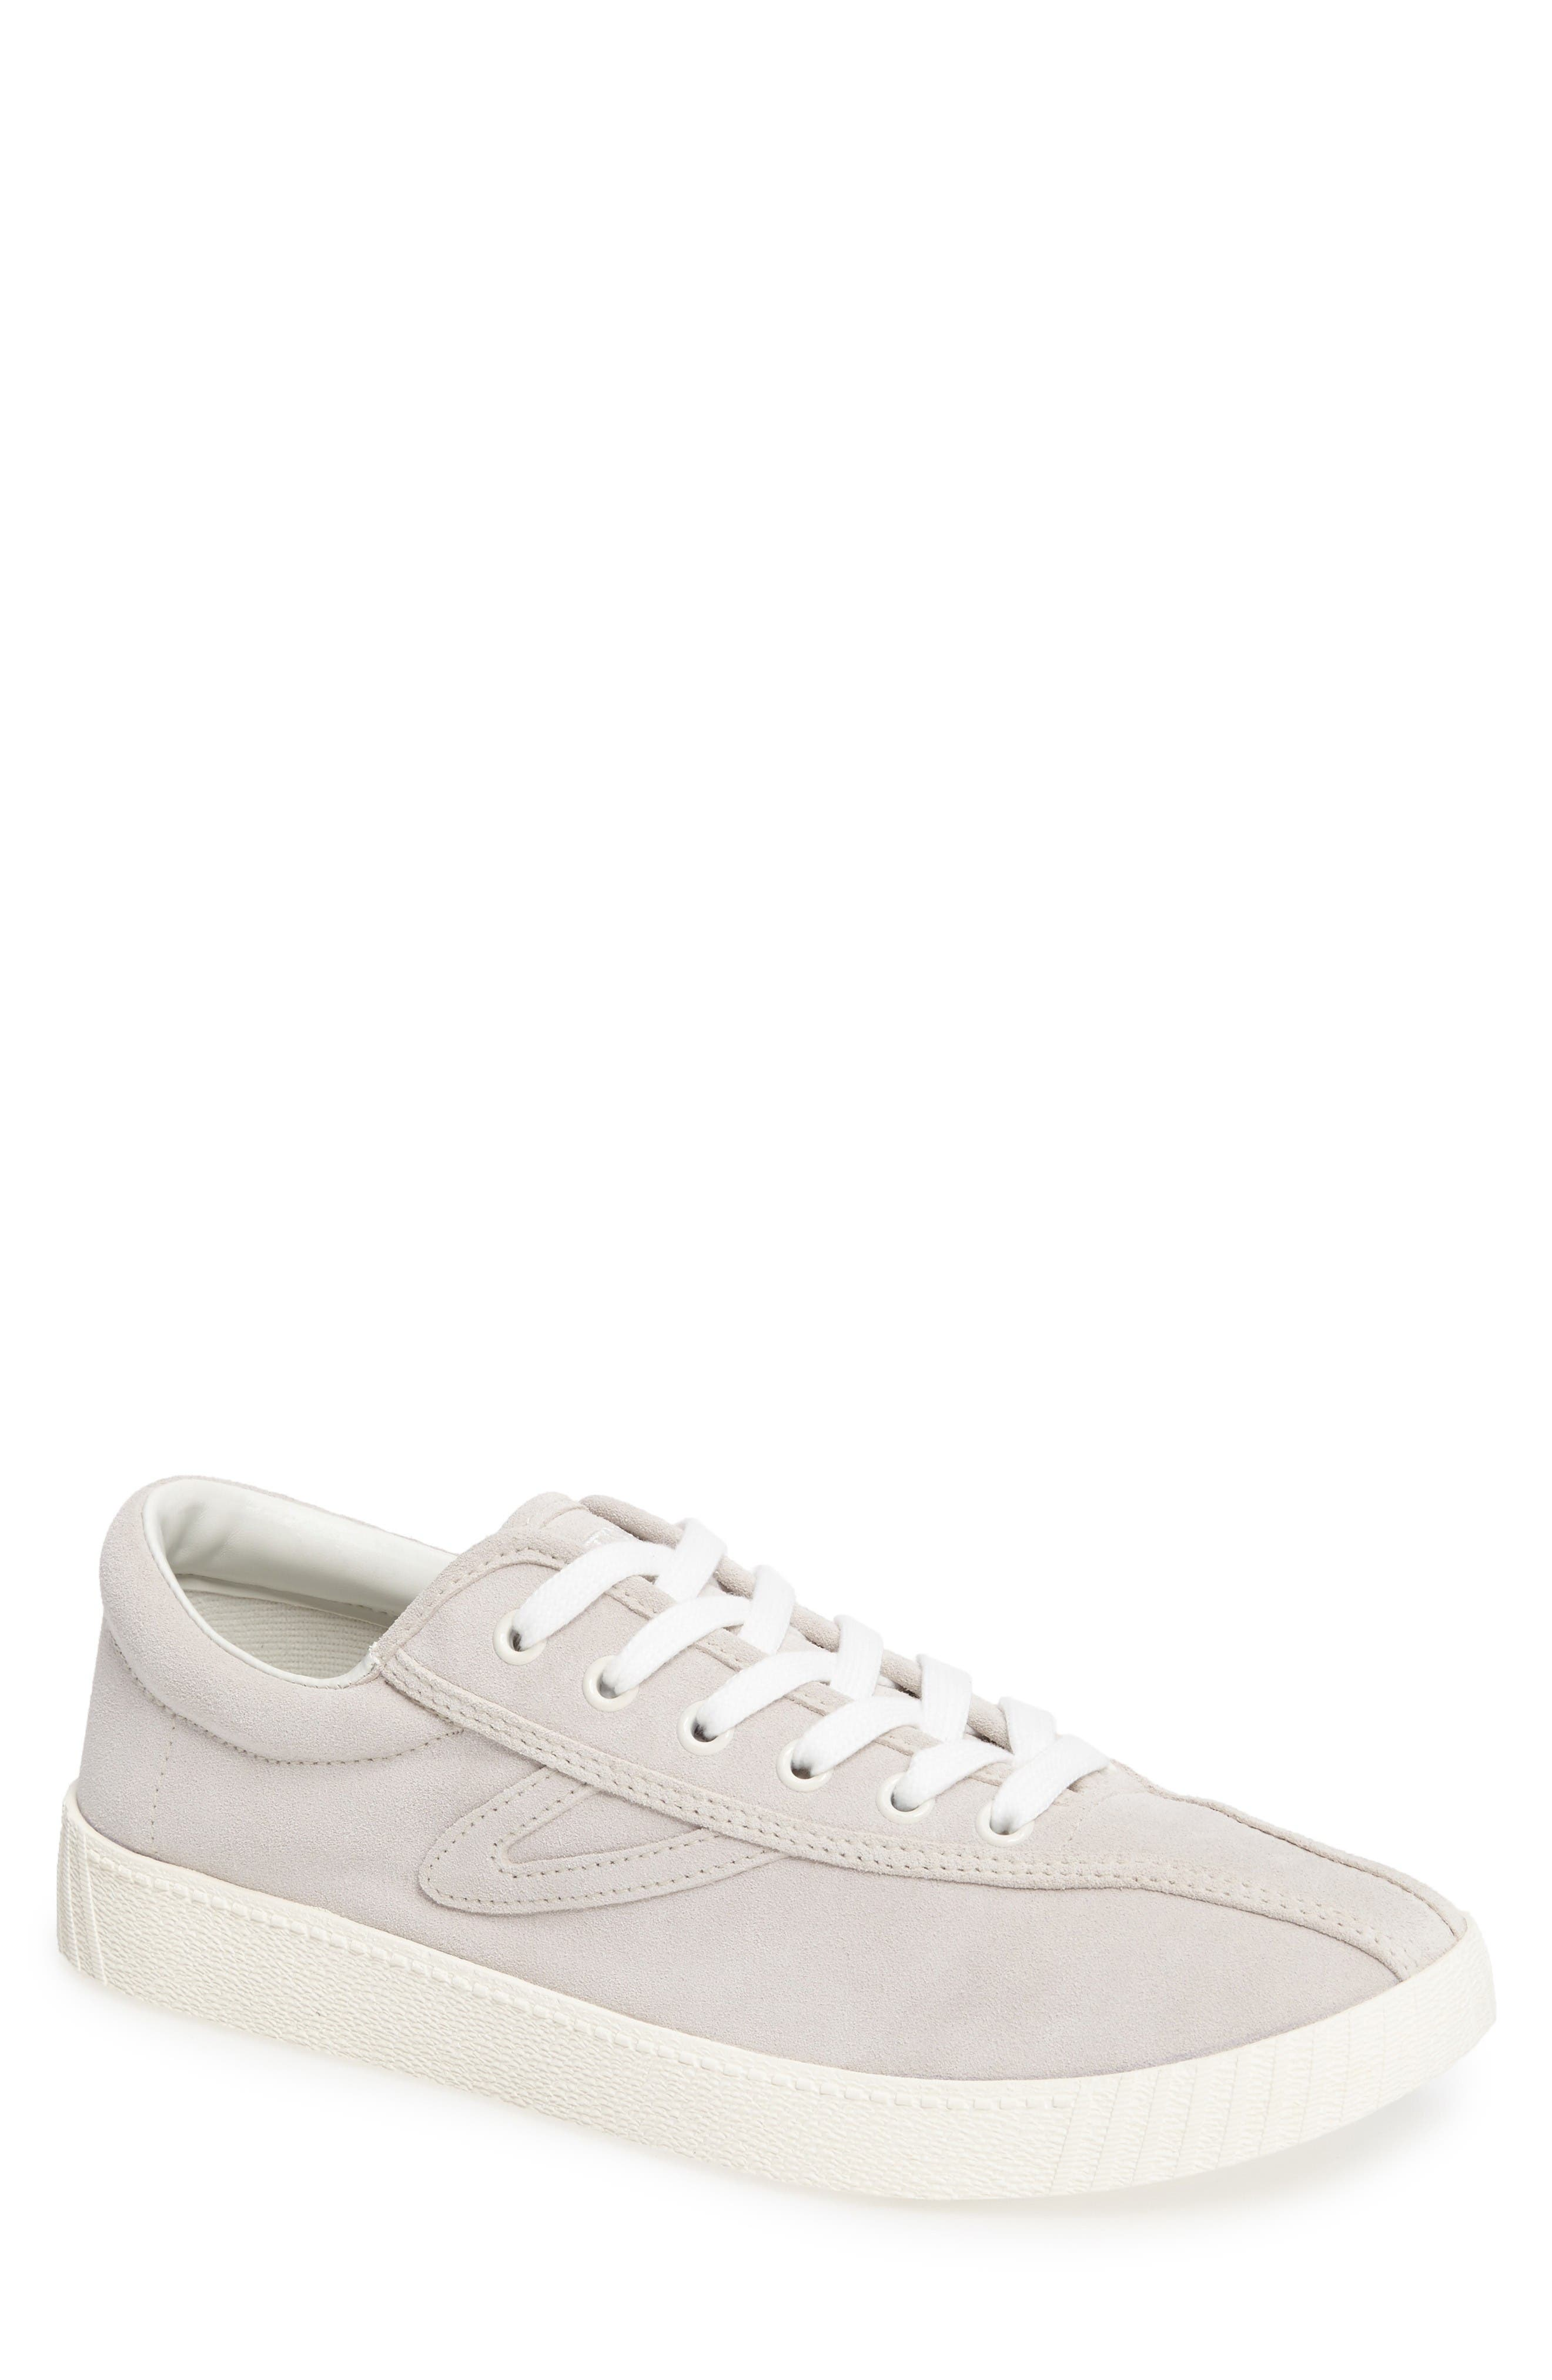 Tretorn Nylite 2 Plus Sneaker (Men)